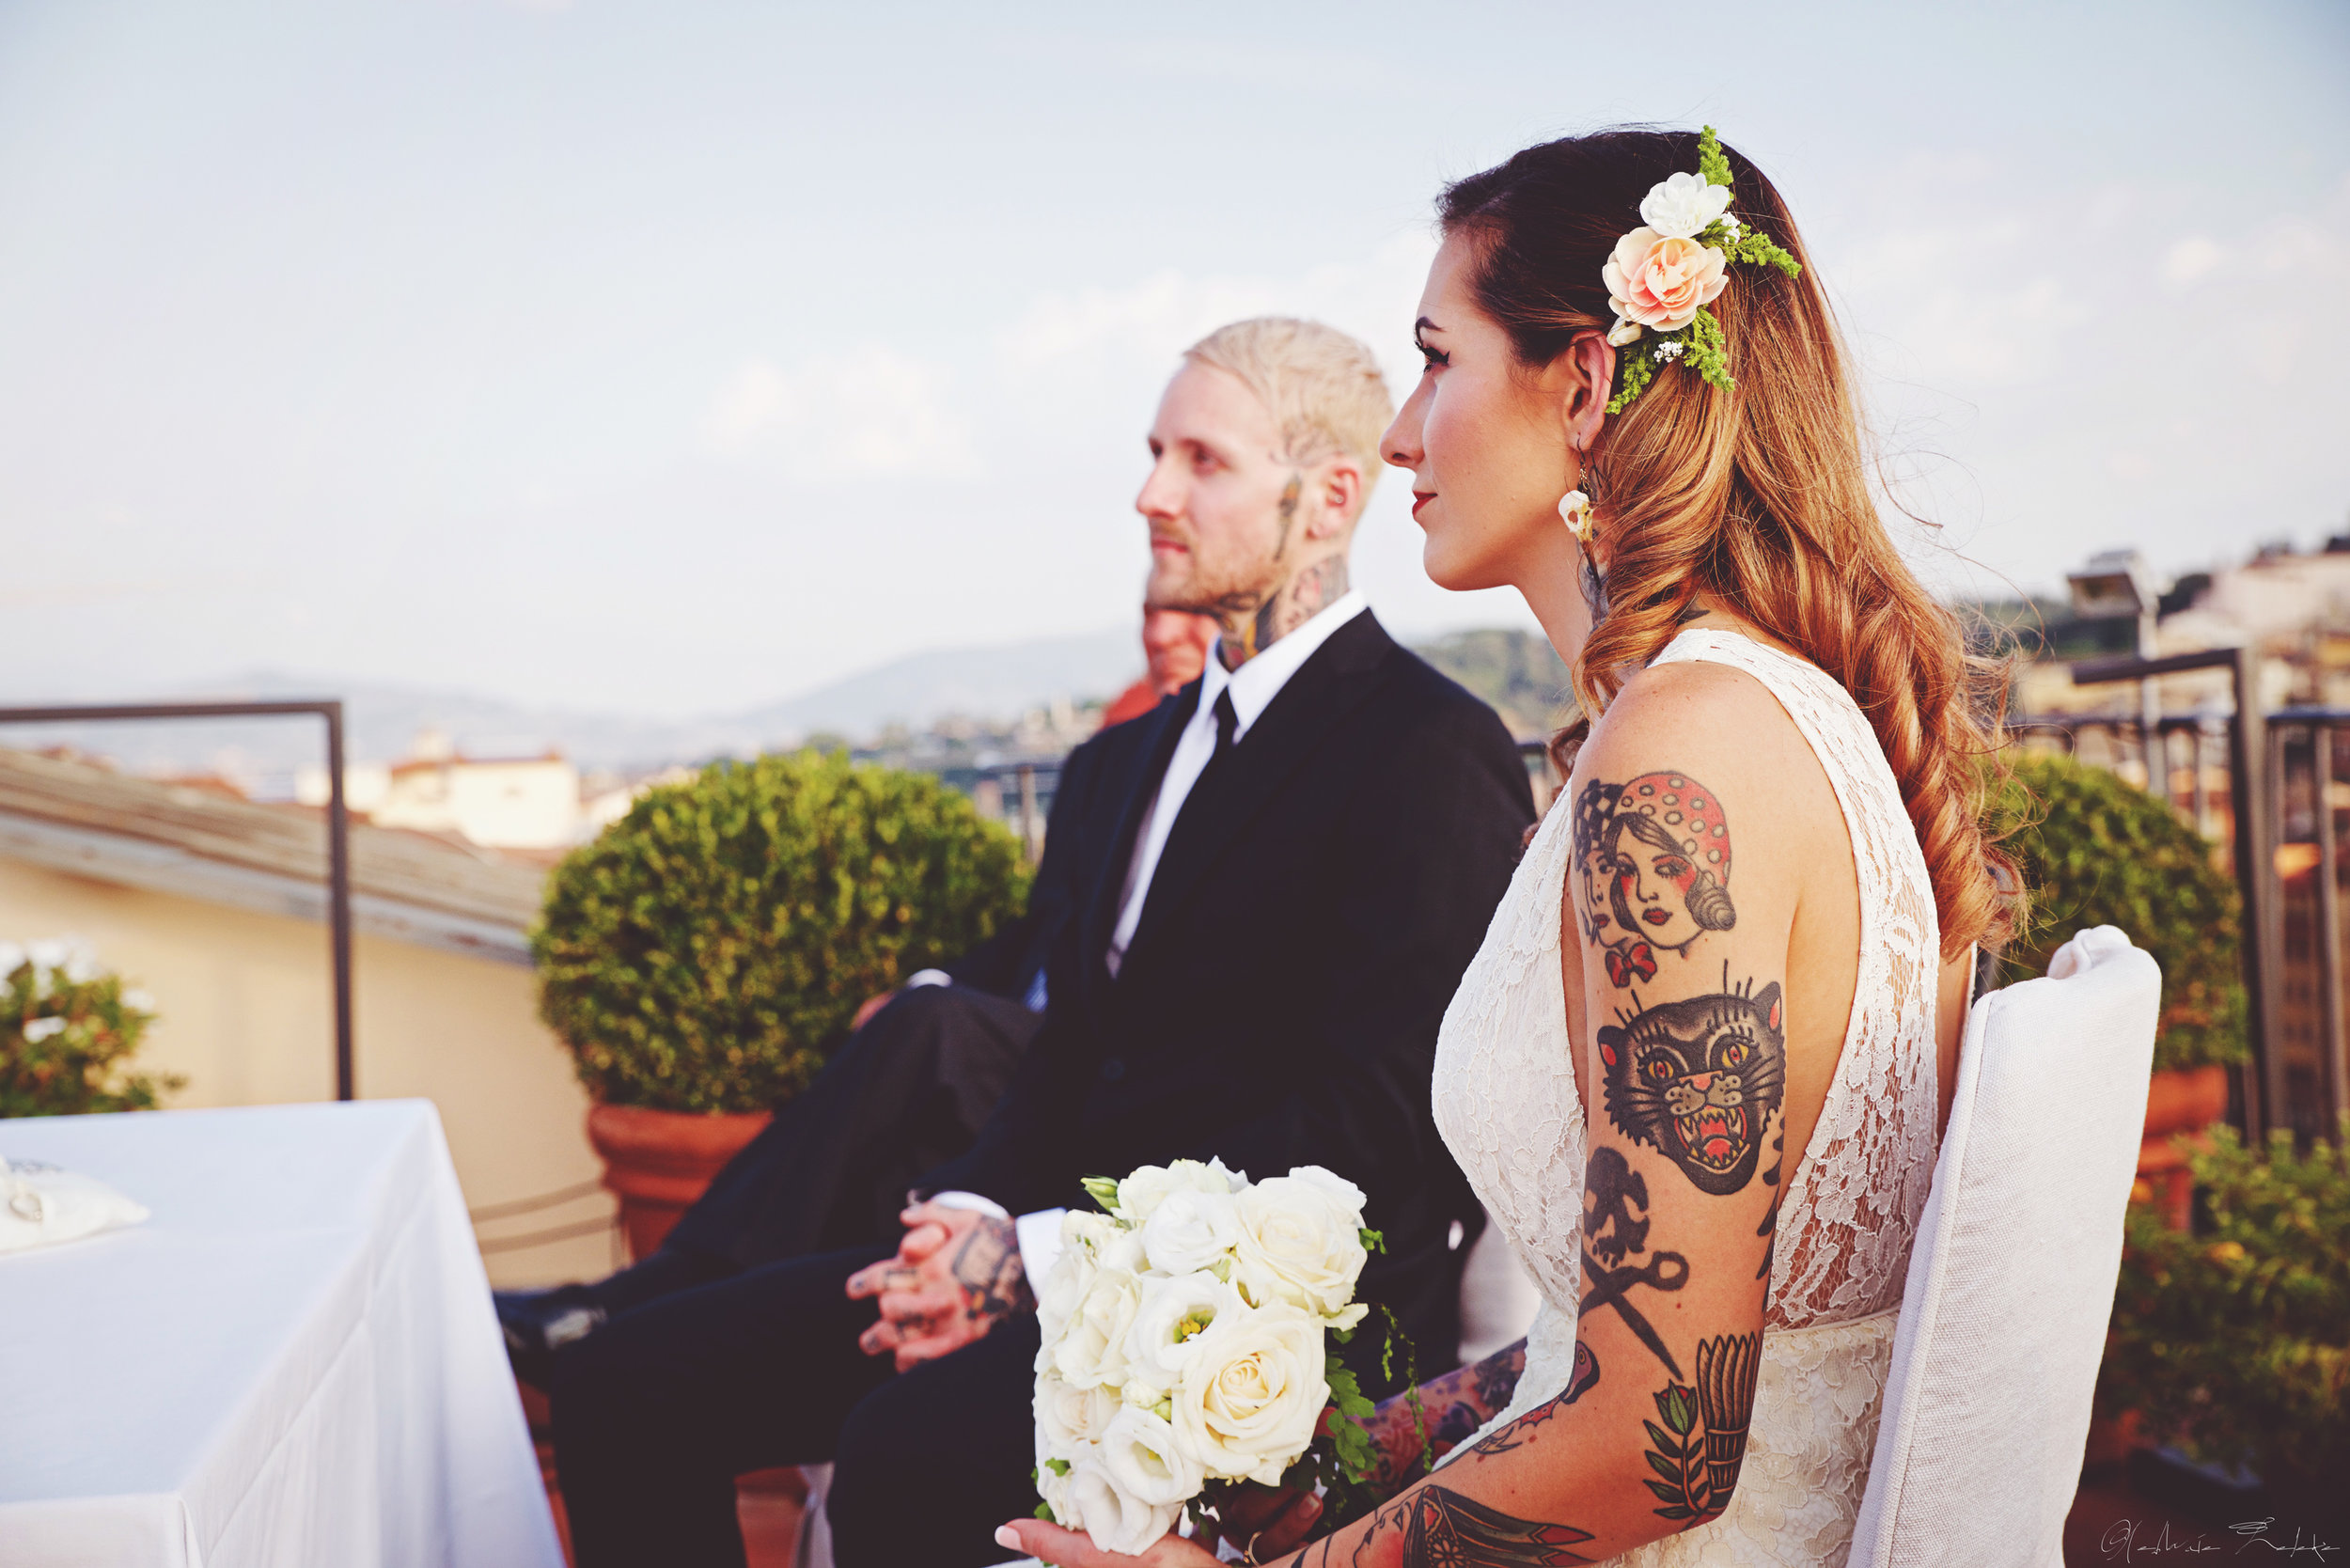 Cassidy-Ryan-Wedding-Florence-55.jpg